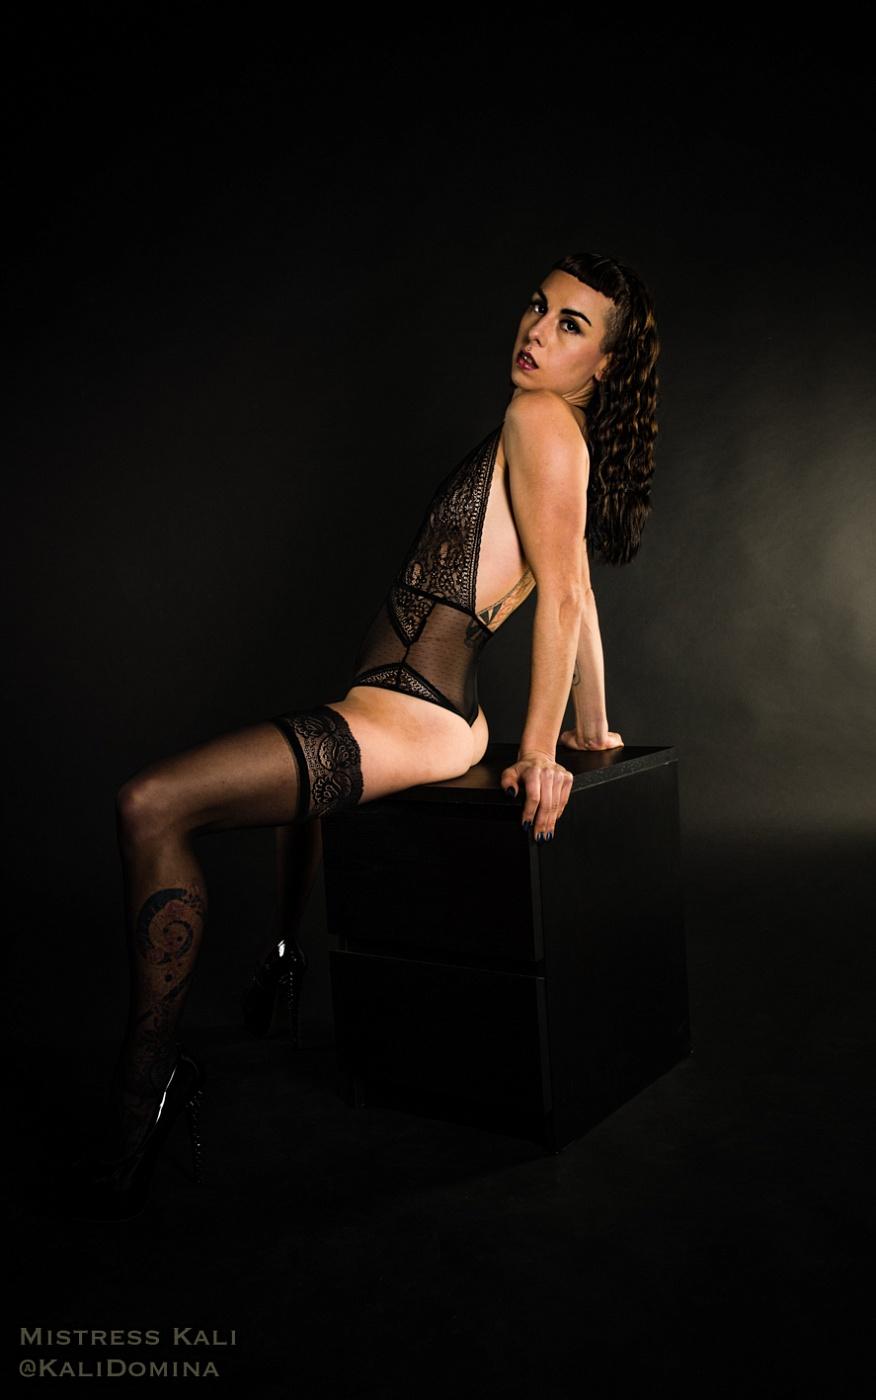 Mistress Kali of London, UK